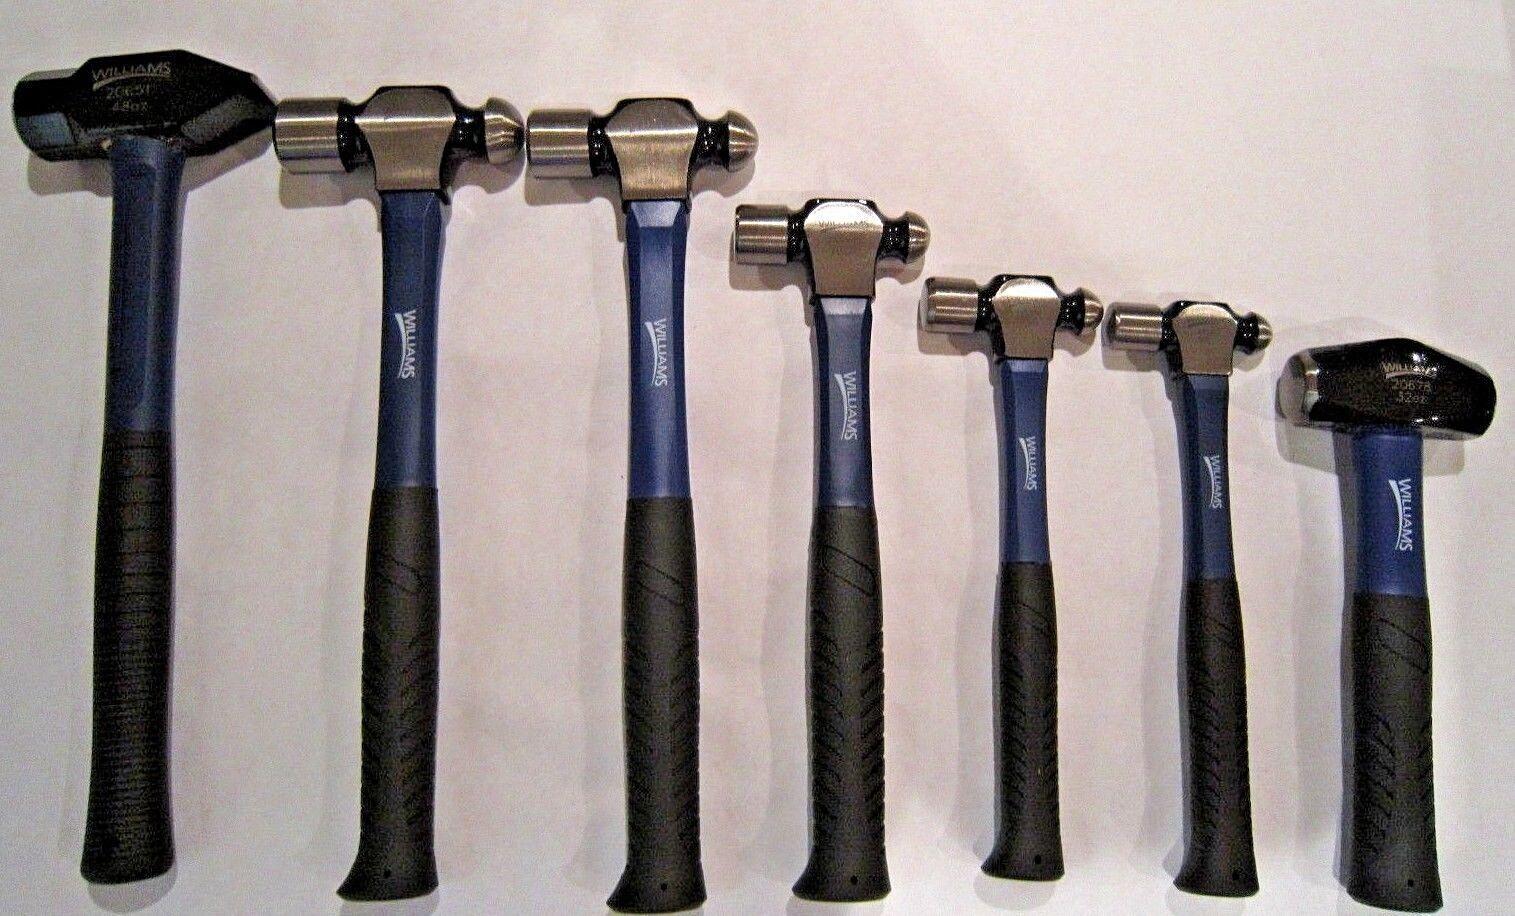 Williams by Snap-On 7 pc Hammer Set Ball Pein 2 lb Drilling & 3 lb Sledge Peen